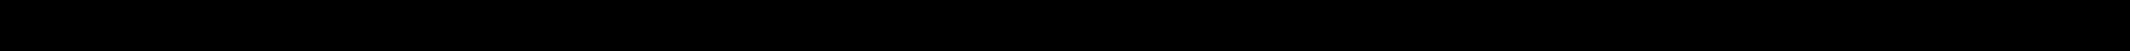 alien-resurrection-font